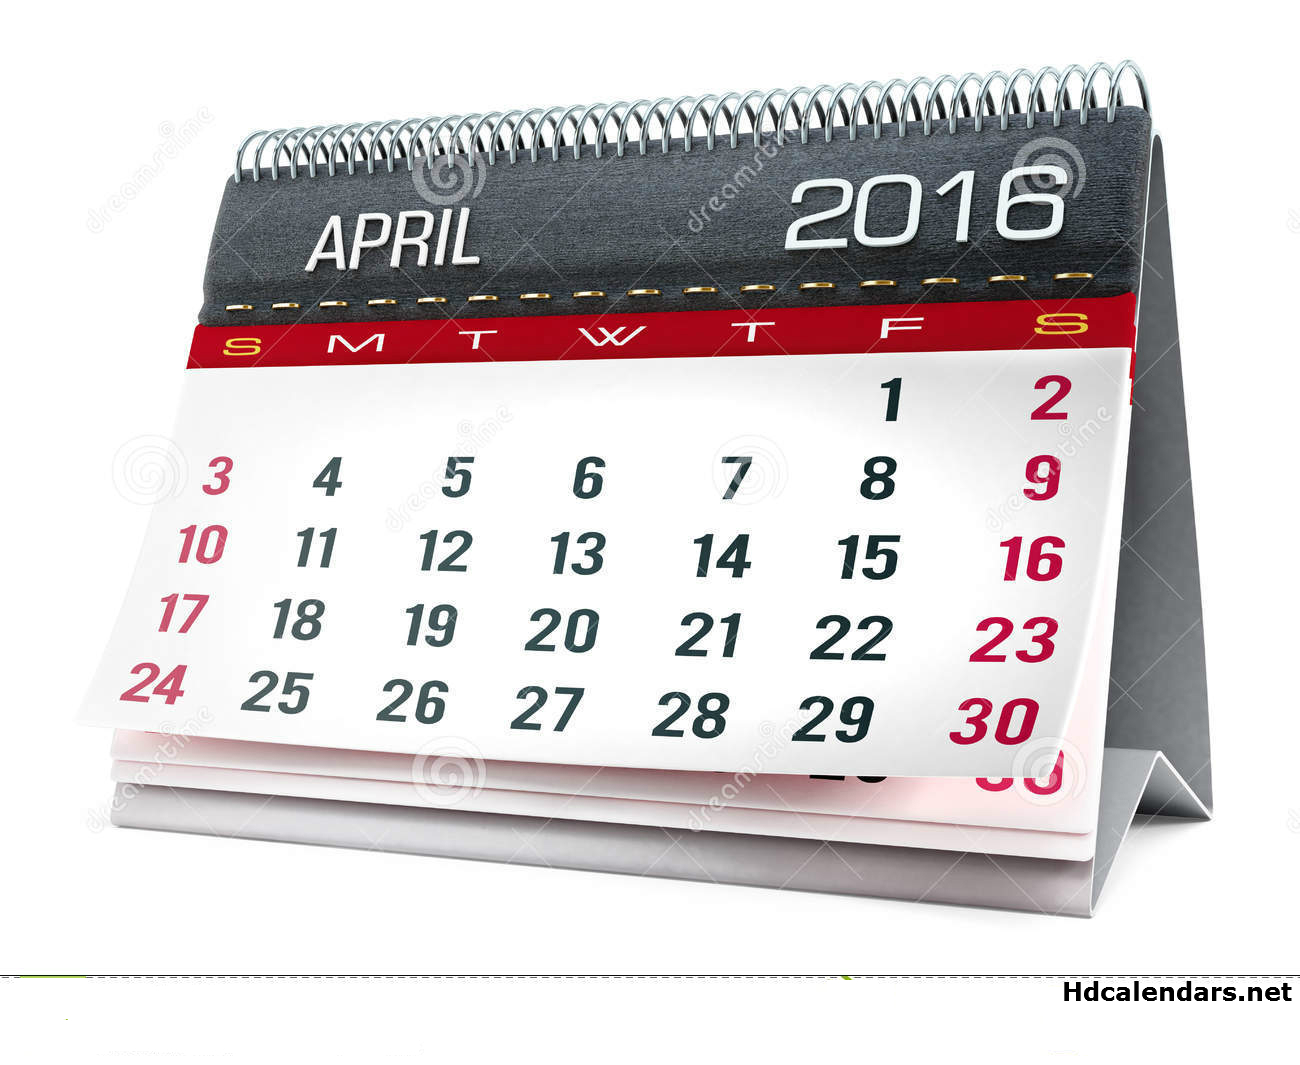 April 2016 calendar clipart svg free stock April 2016 Calendar New Zealand svg free stock